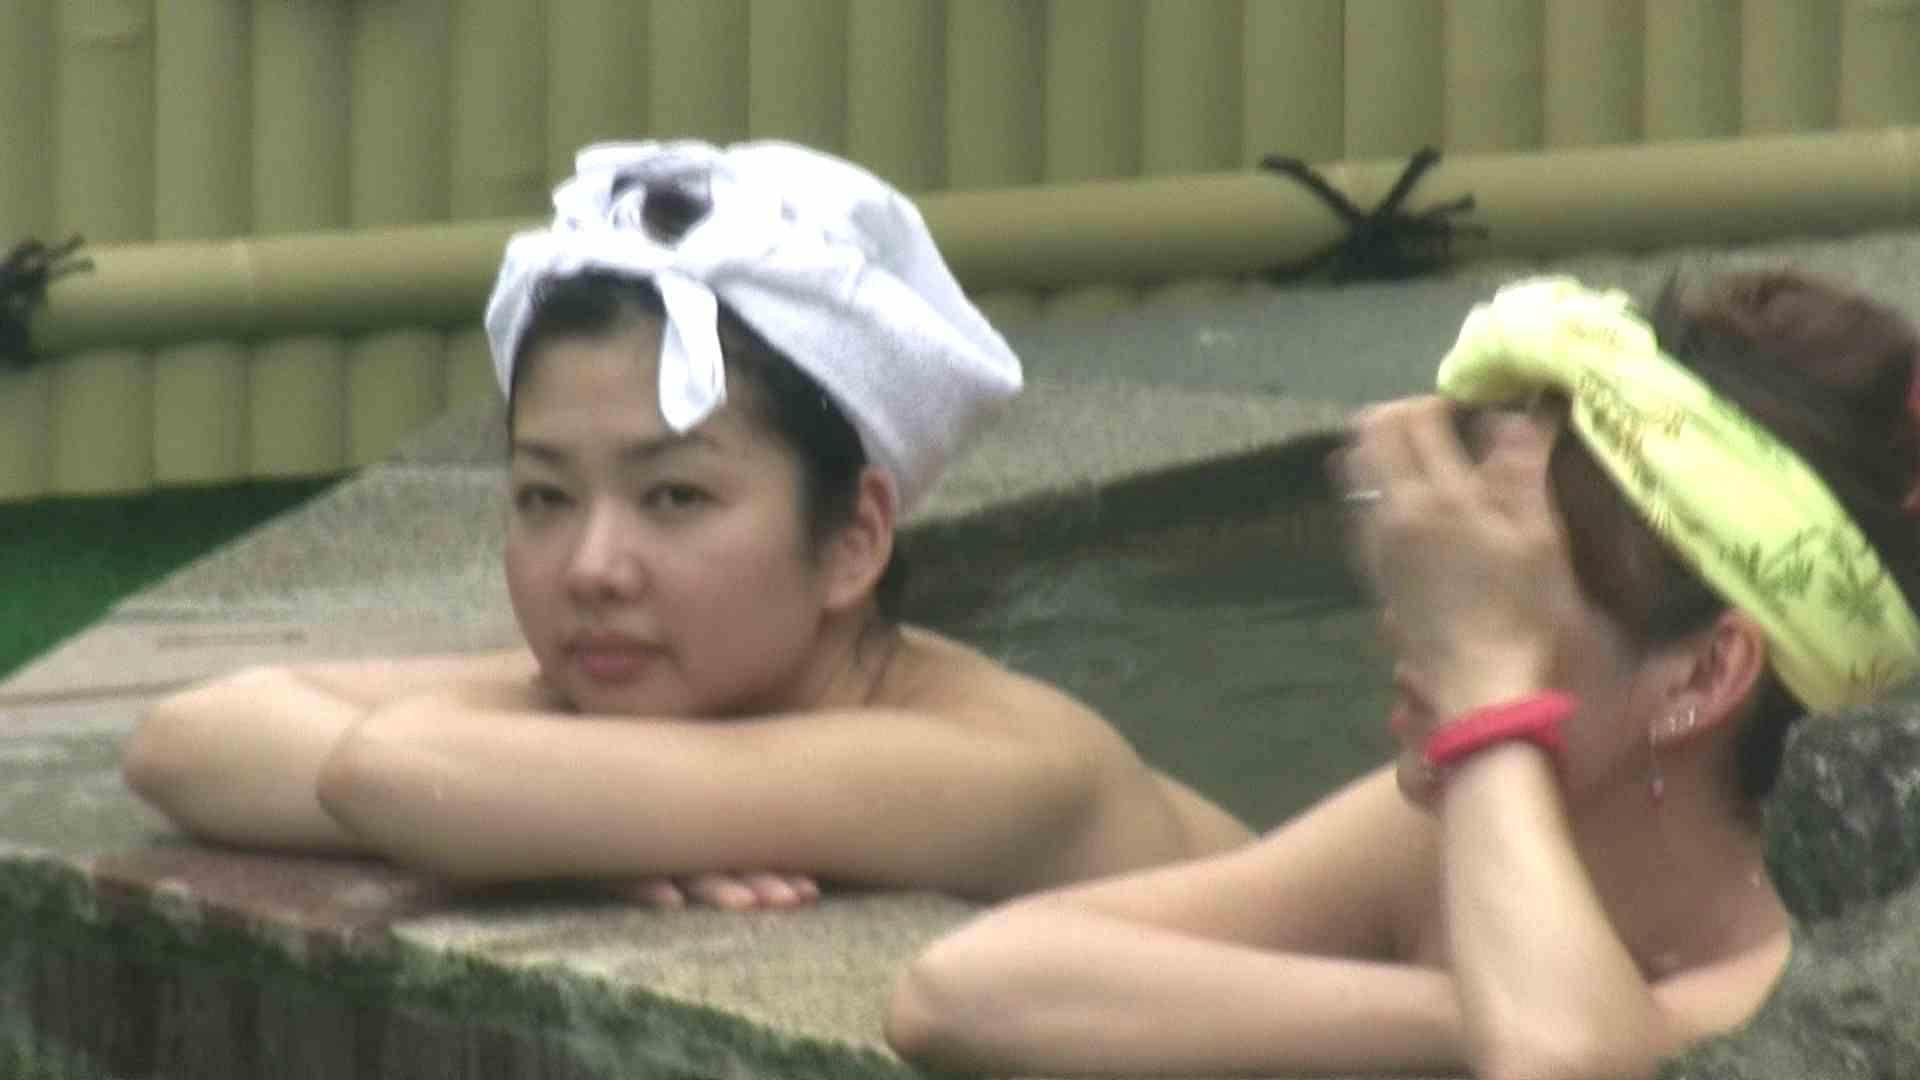 Aquaな露天風呂Vol.192 美しいOLの裸体 えろ無修正画像 101pic 41